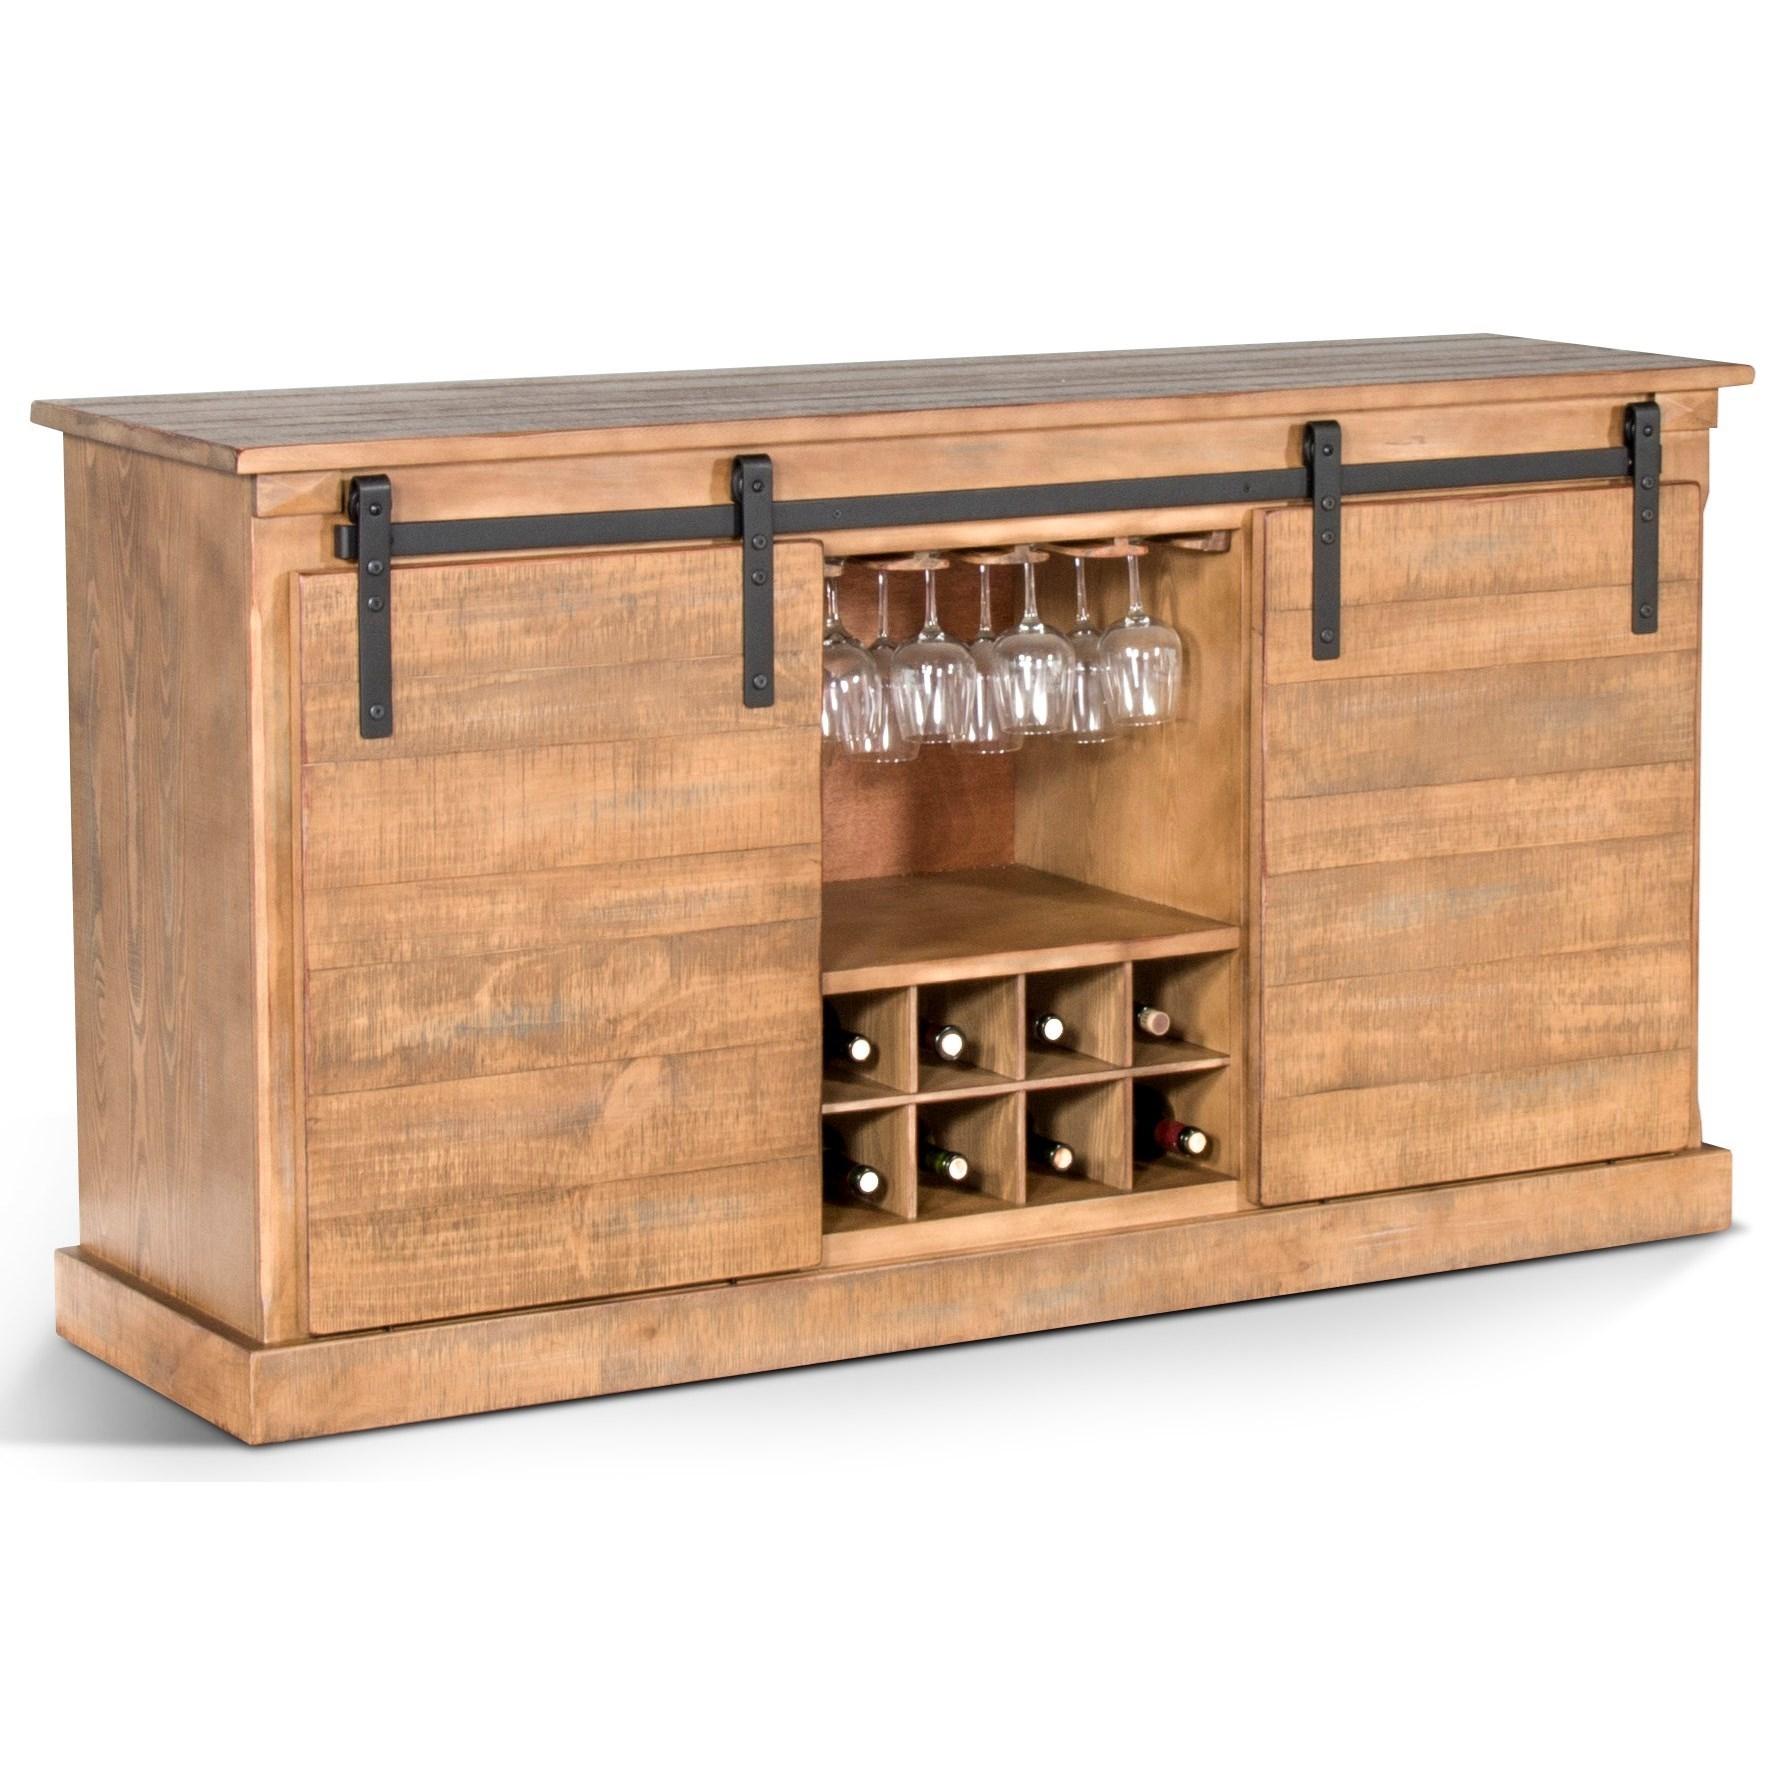 "3577 65"" TV Stand w/ Wine Rack & Barn Door at Sadler's Home Furnishings"